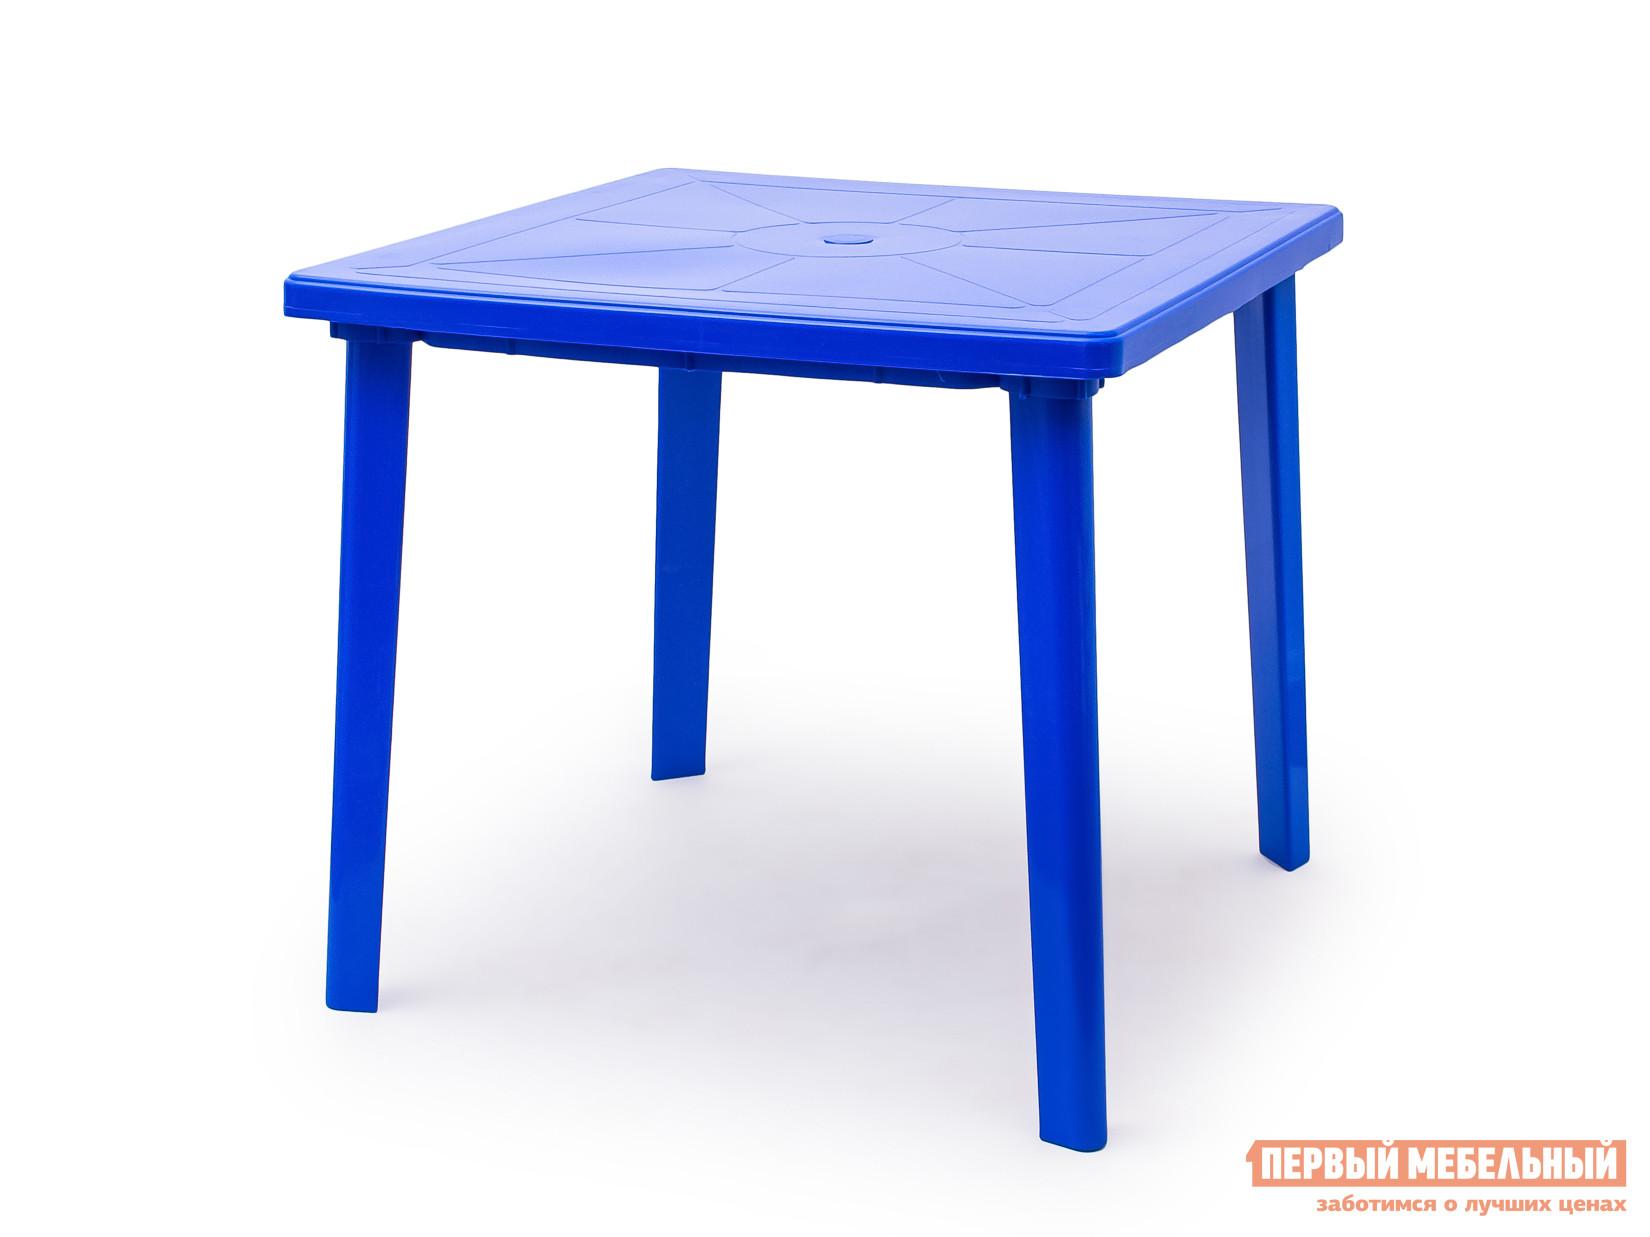 Пластиковый стол Стандарт Пластик Стол квадратный (800х800х710) Синий